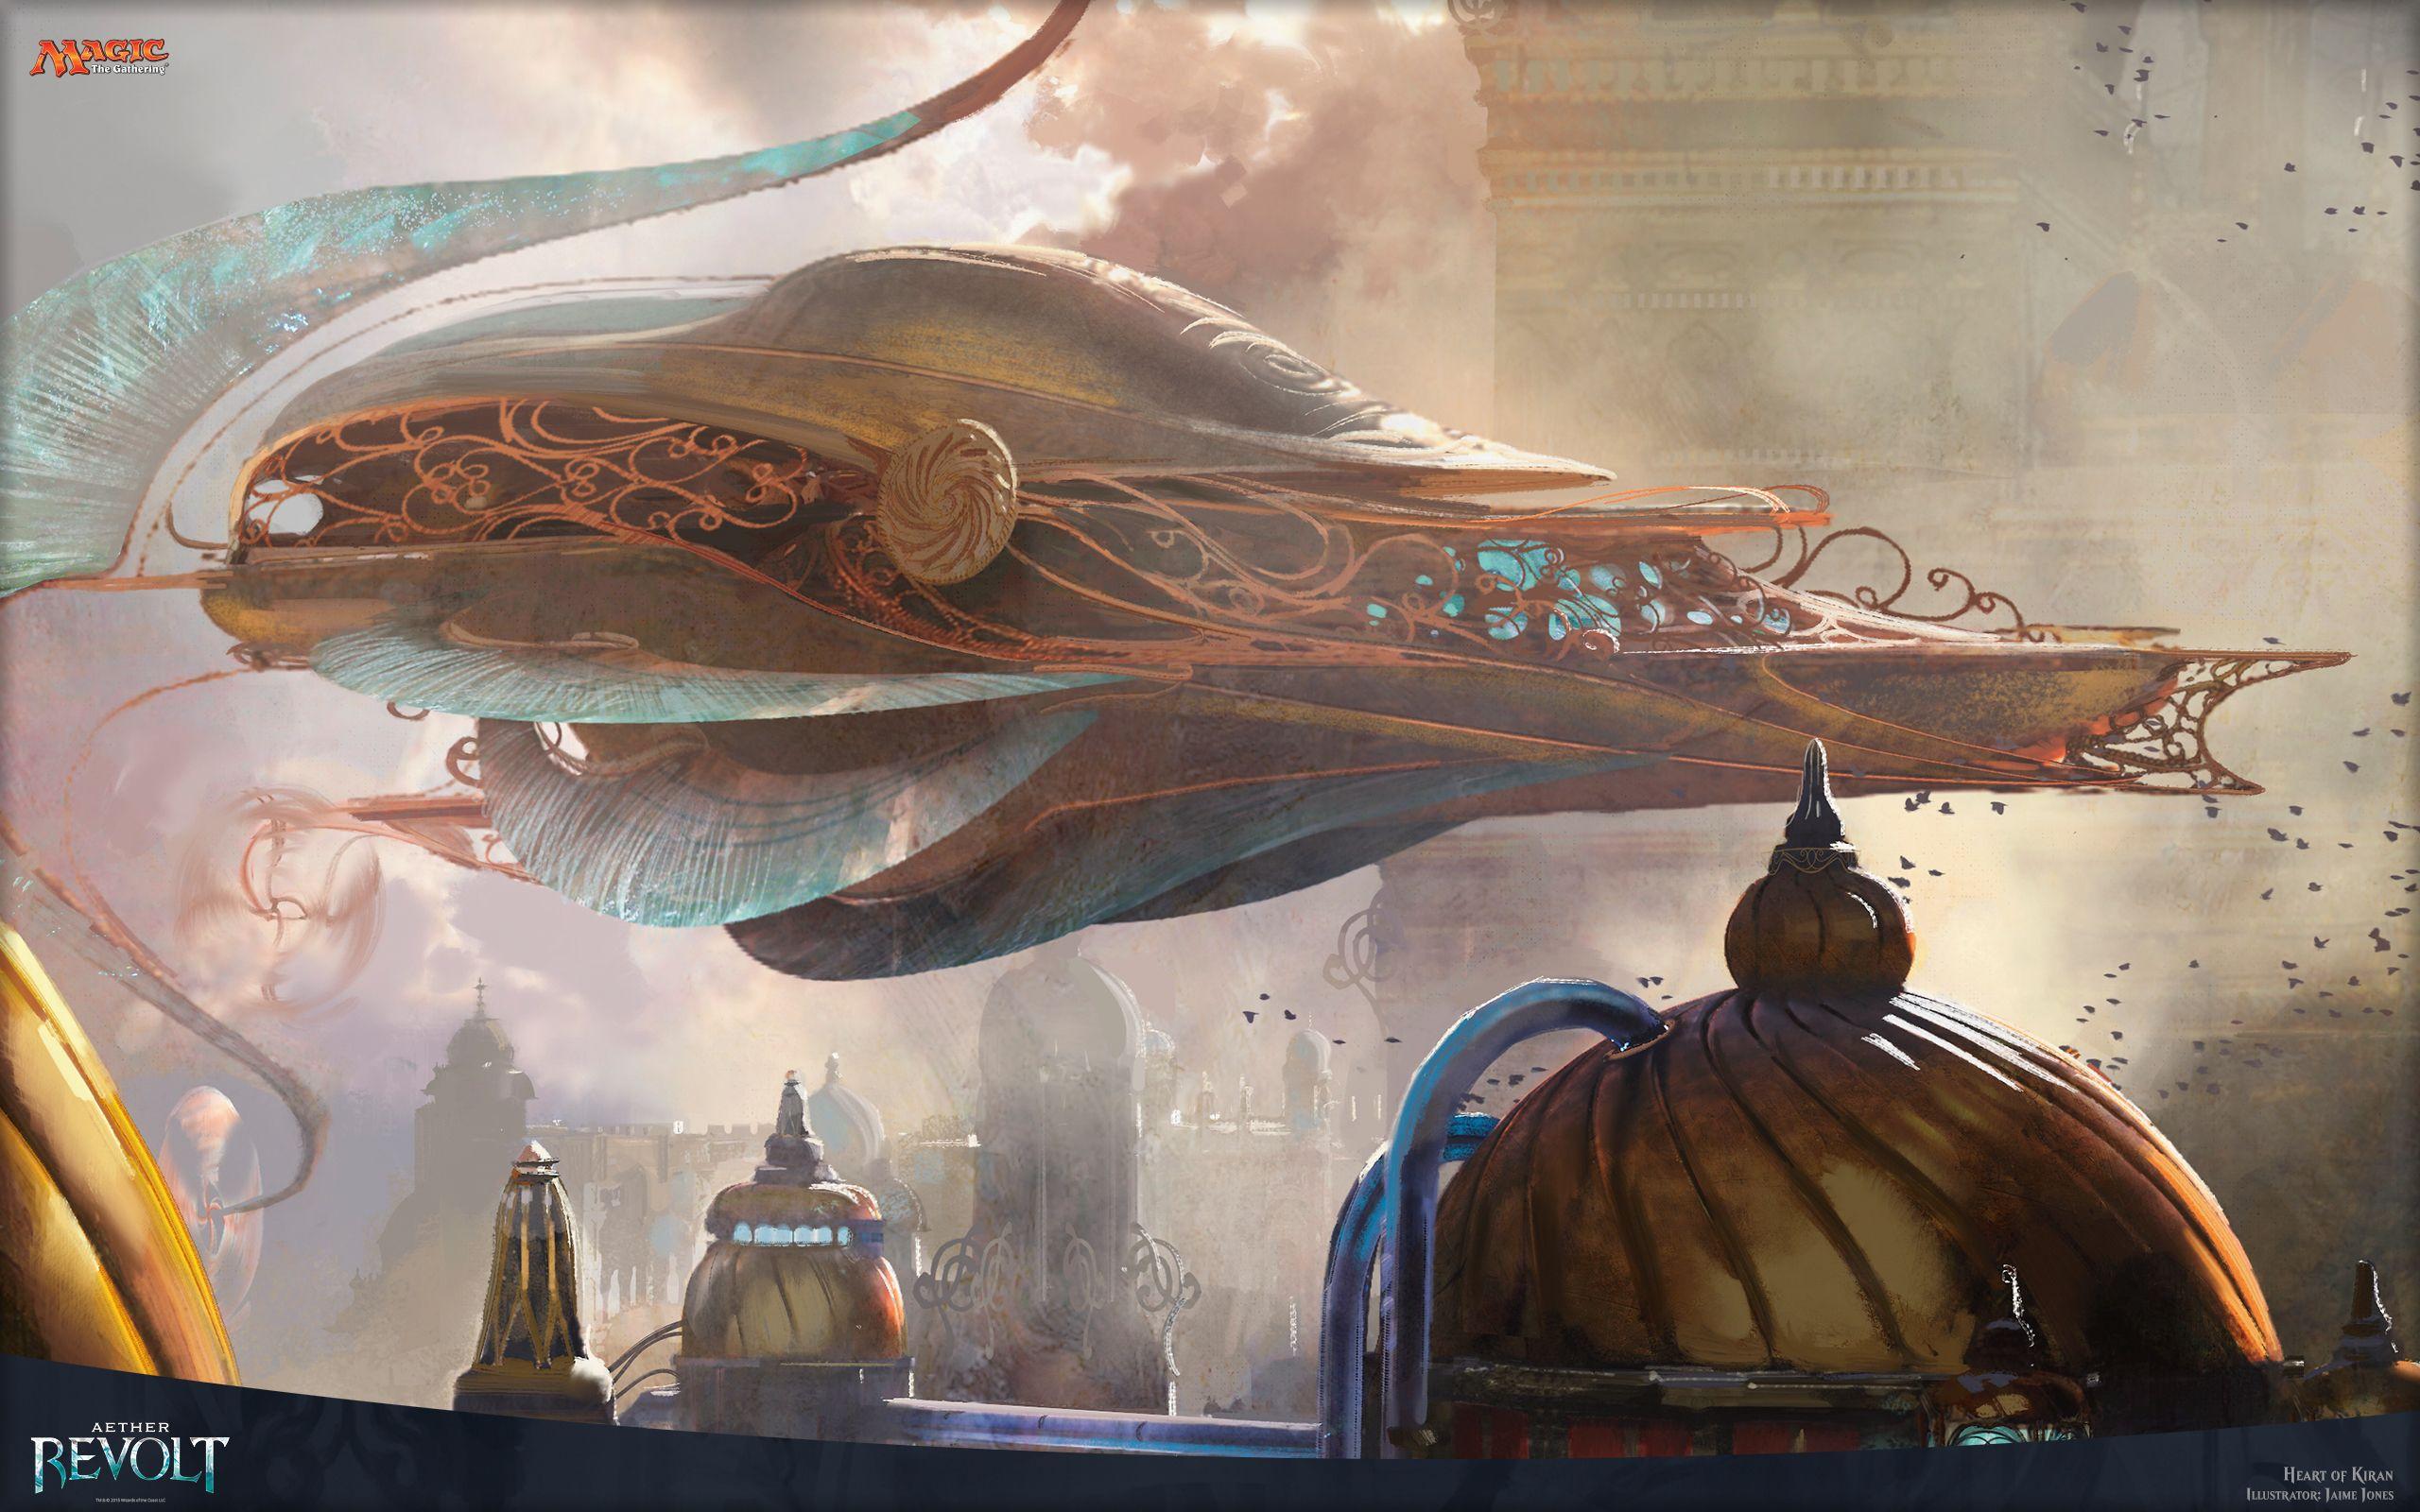 http://magic.wizards.com/sites/mtg/files/images/wallpaper/GNN0LkGMVa_AER_2560x1600_Wallpaper.jpg